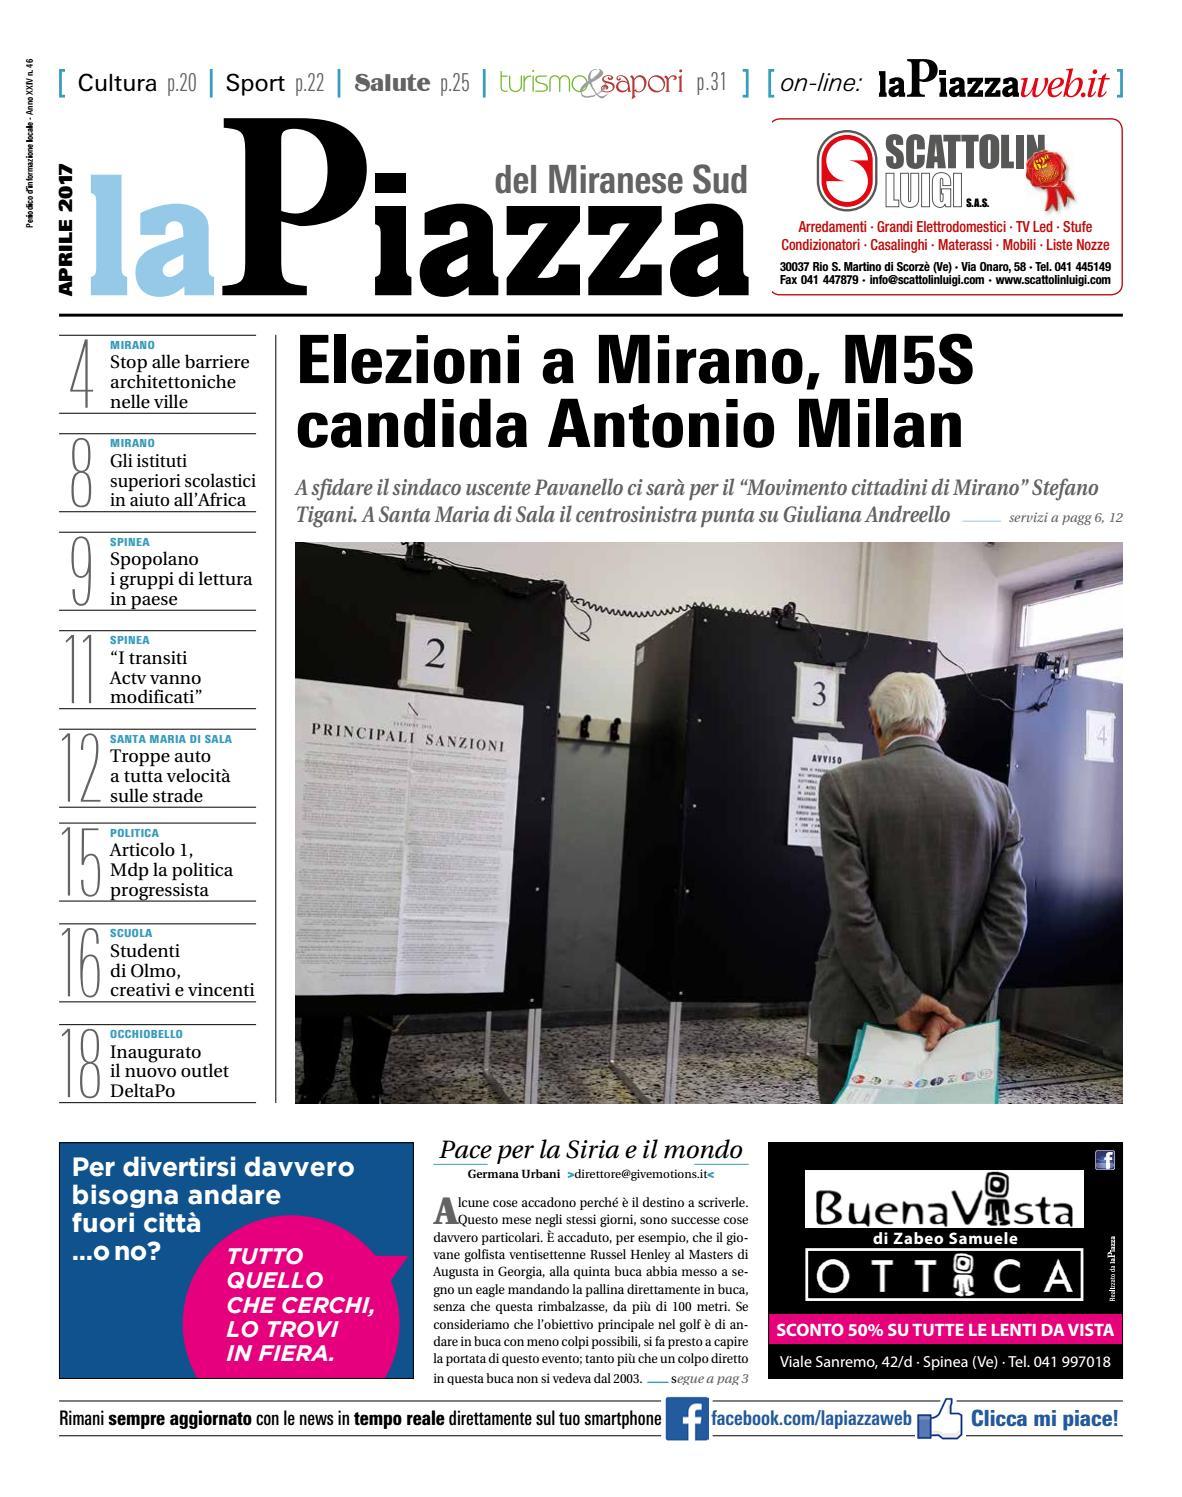 Fontanella Arredamenti Snc Belluno Bl miranese sud apr2017 n46 by lapiazza give emotions - issuu